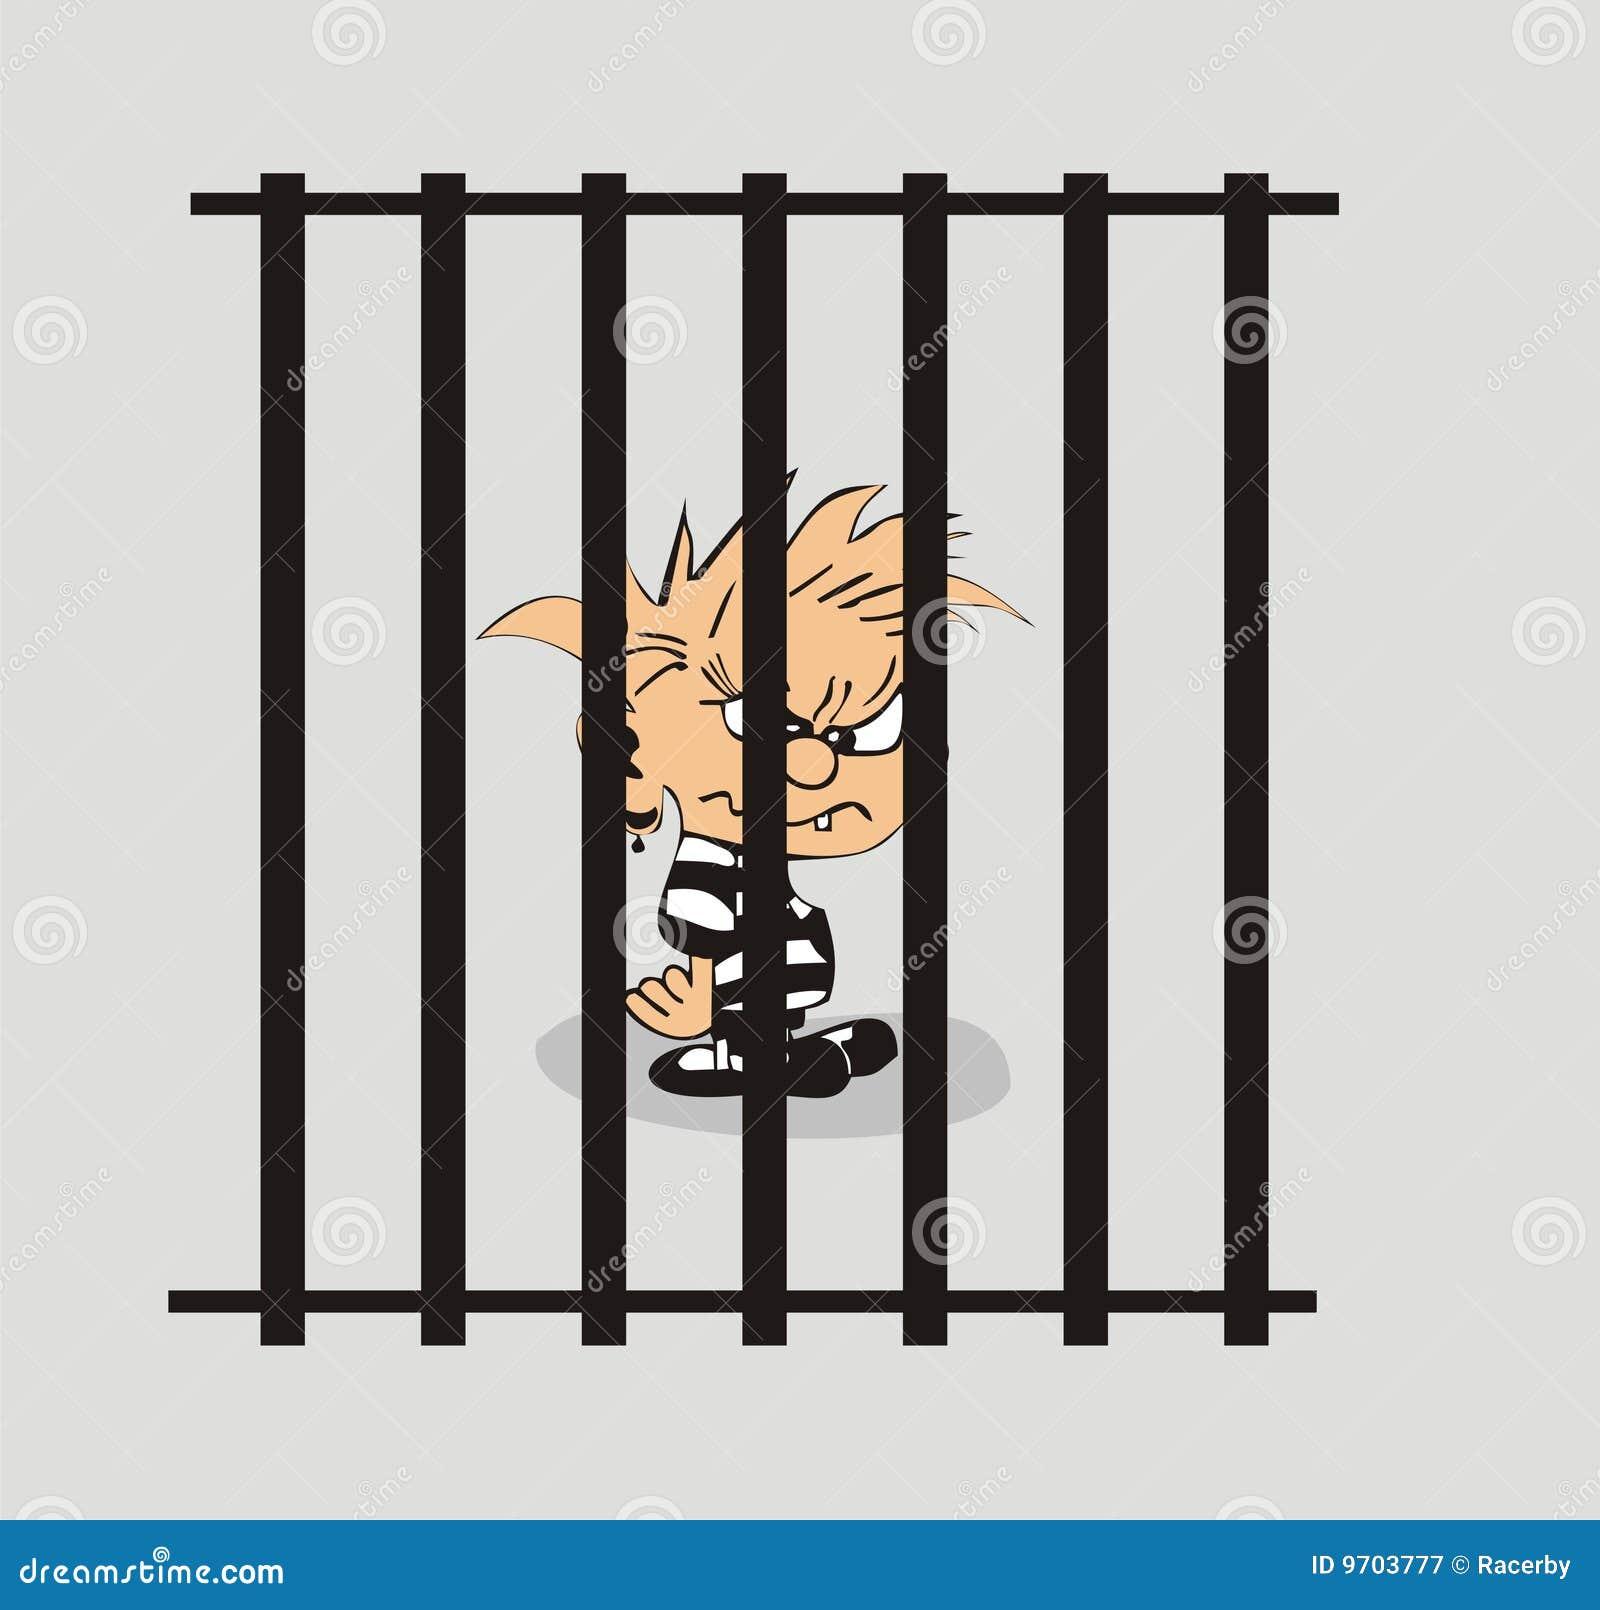 Prison cartoon royalty free stock photography image 9703777 for Barreaux de fenetre